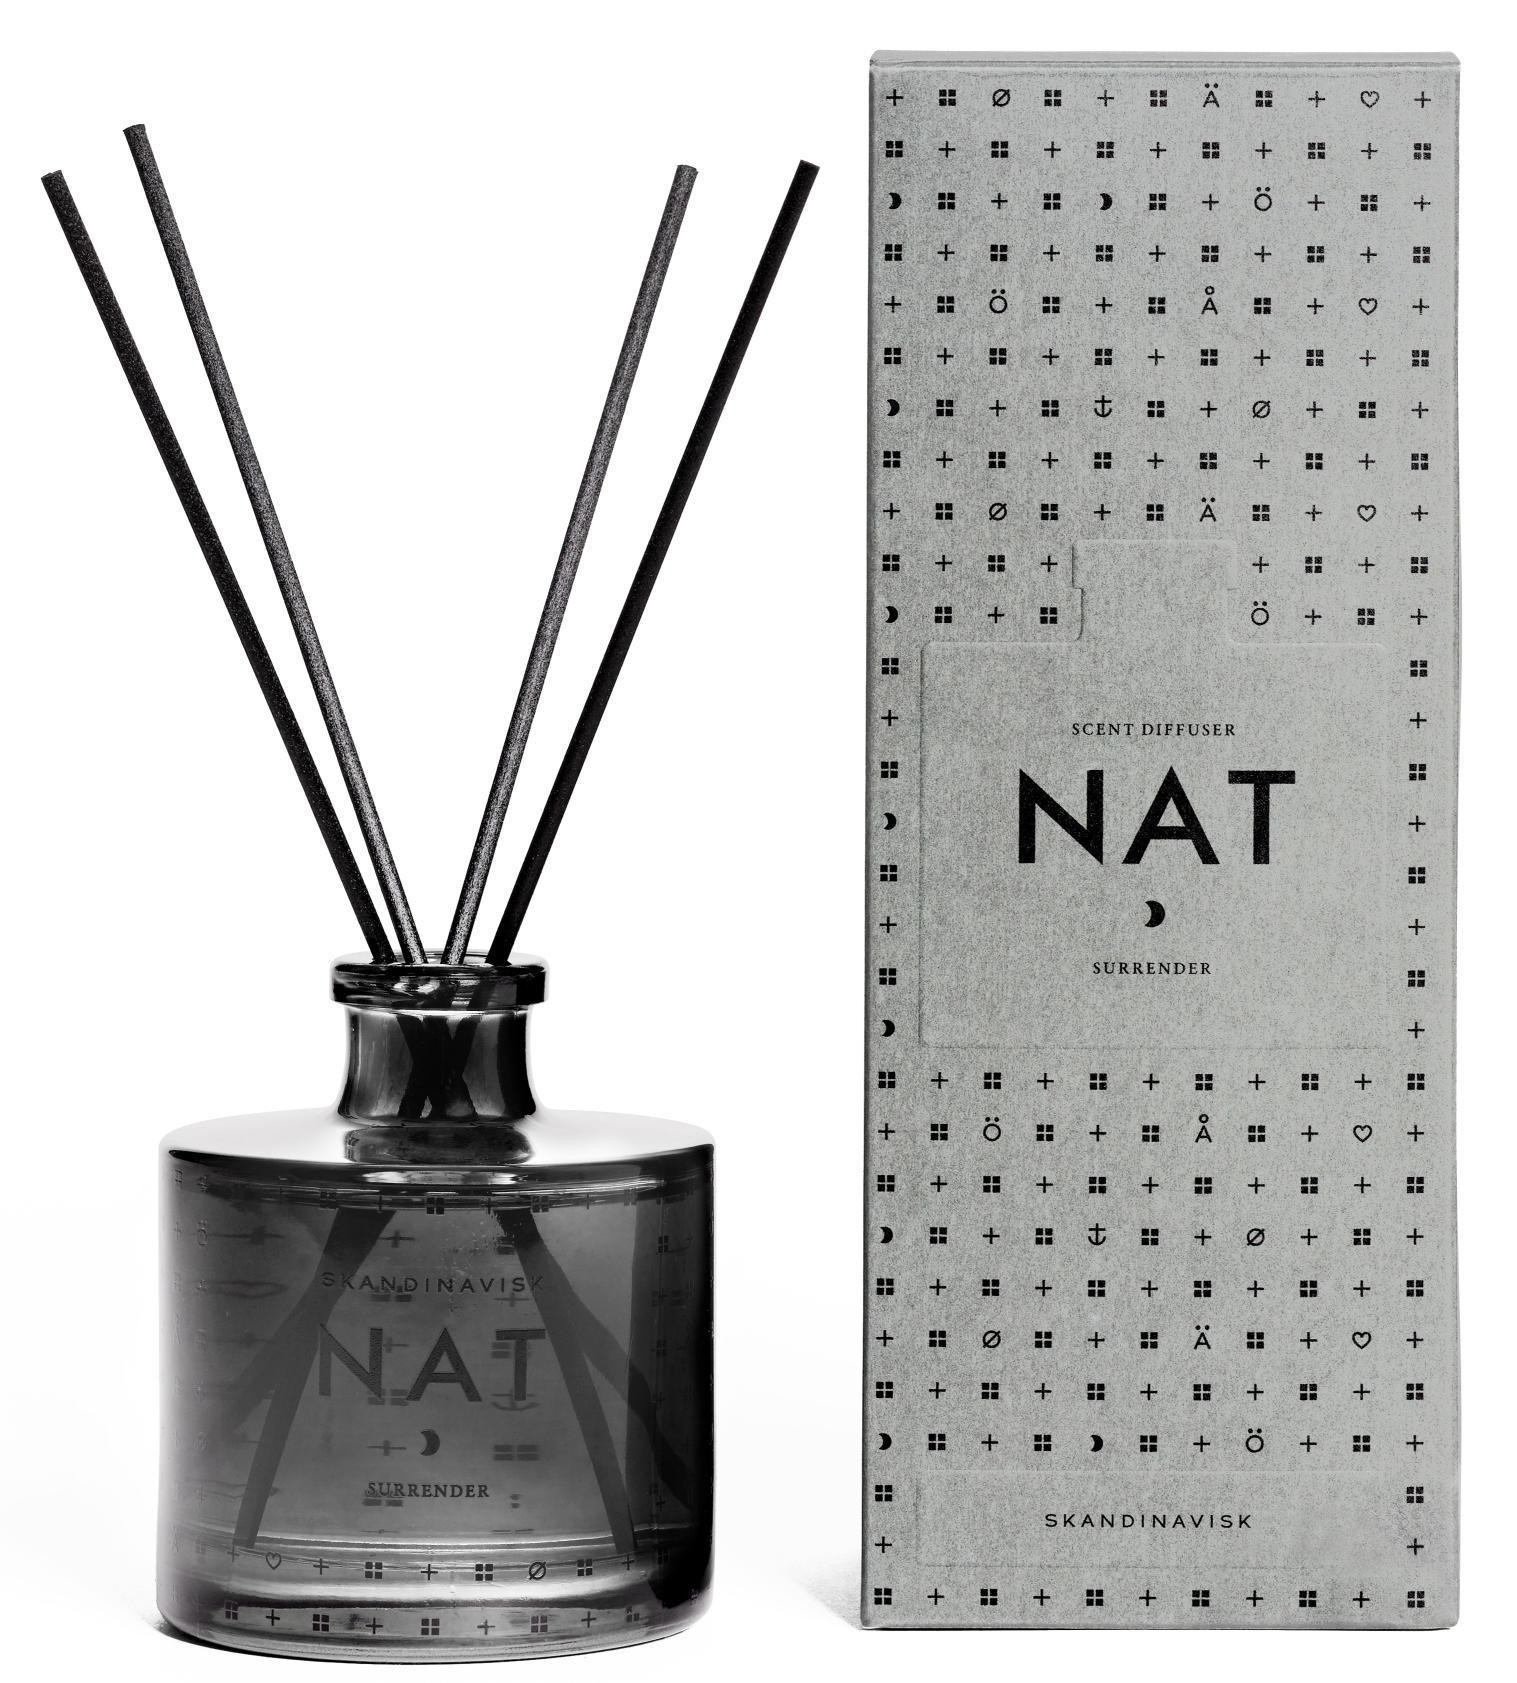 SKANDINAVISK Vonný difuzér NAT (noc) 200 ml, šedá barva, sklo